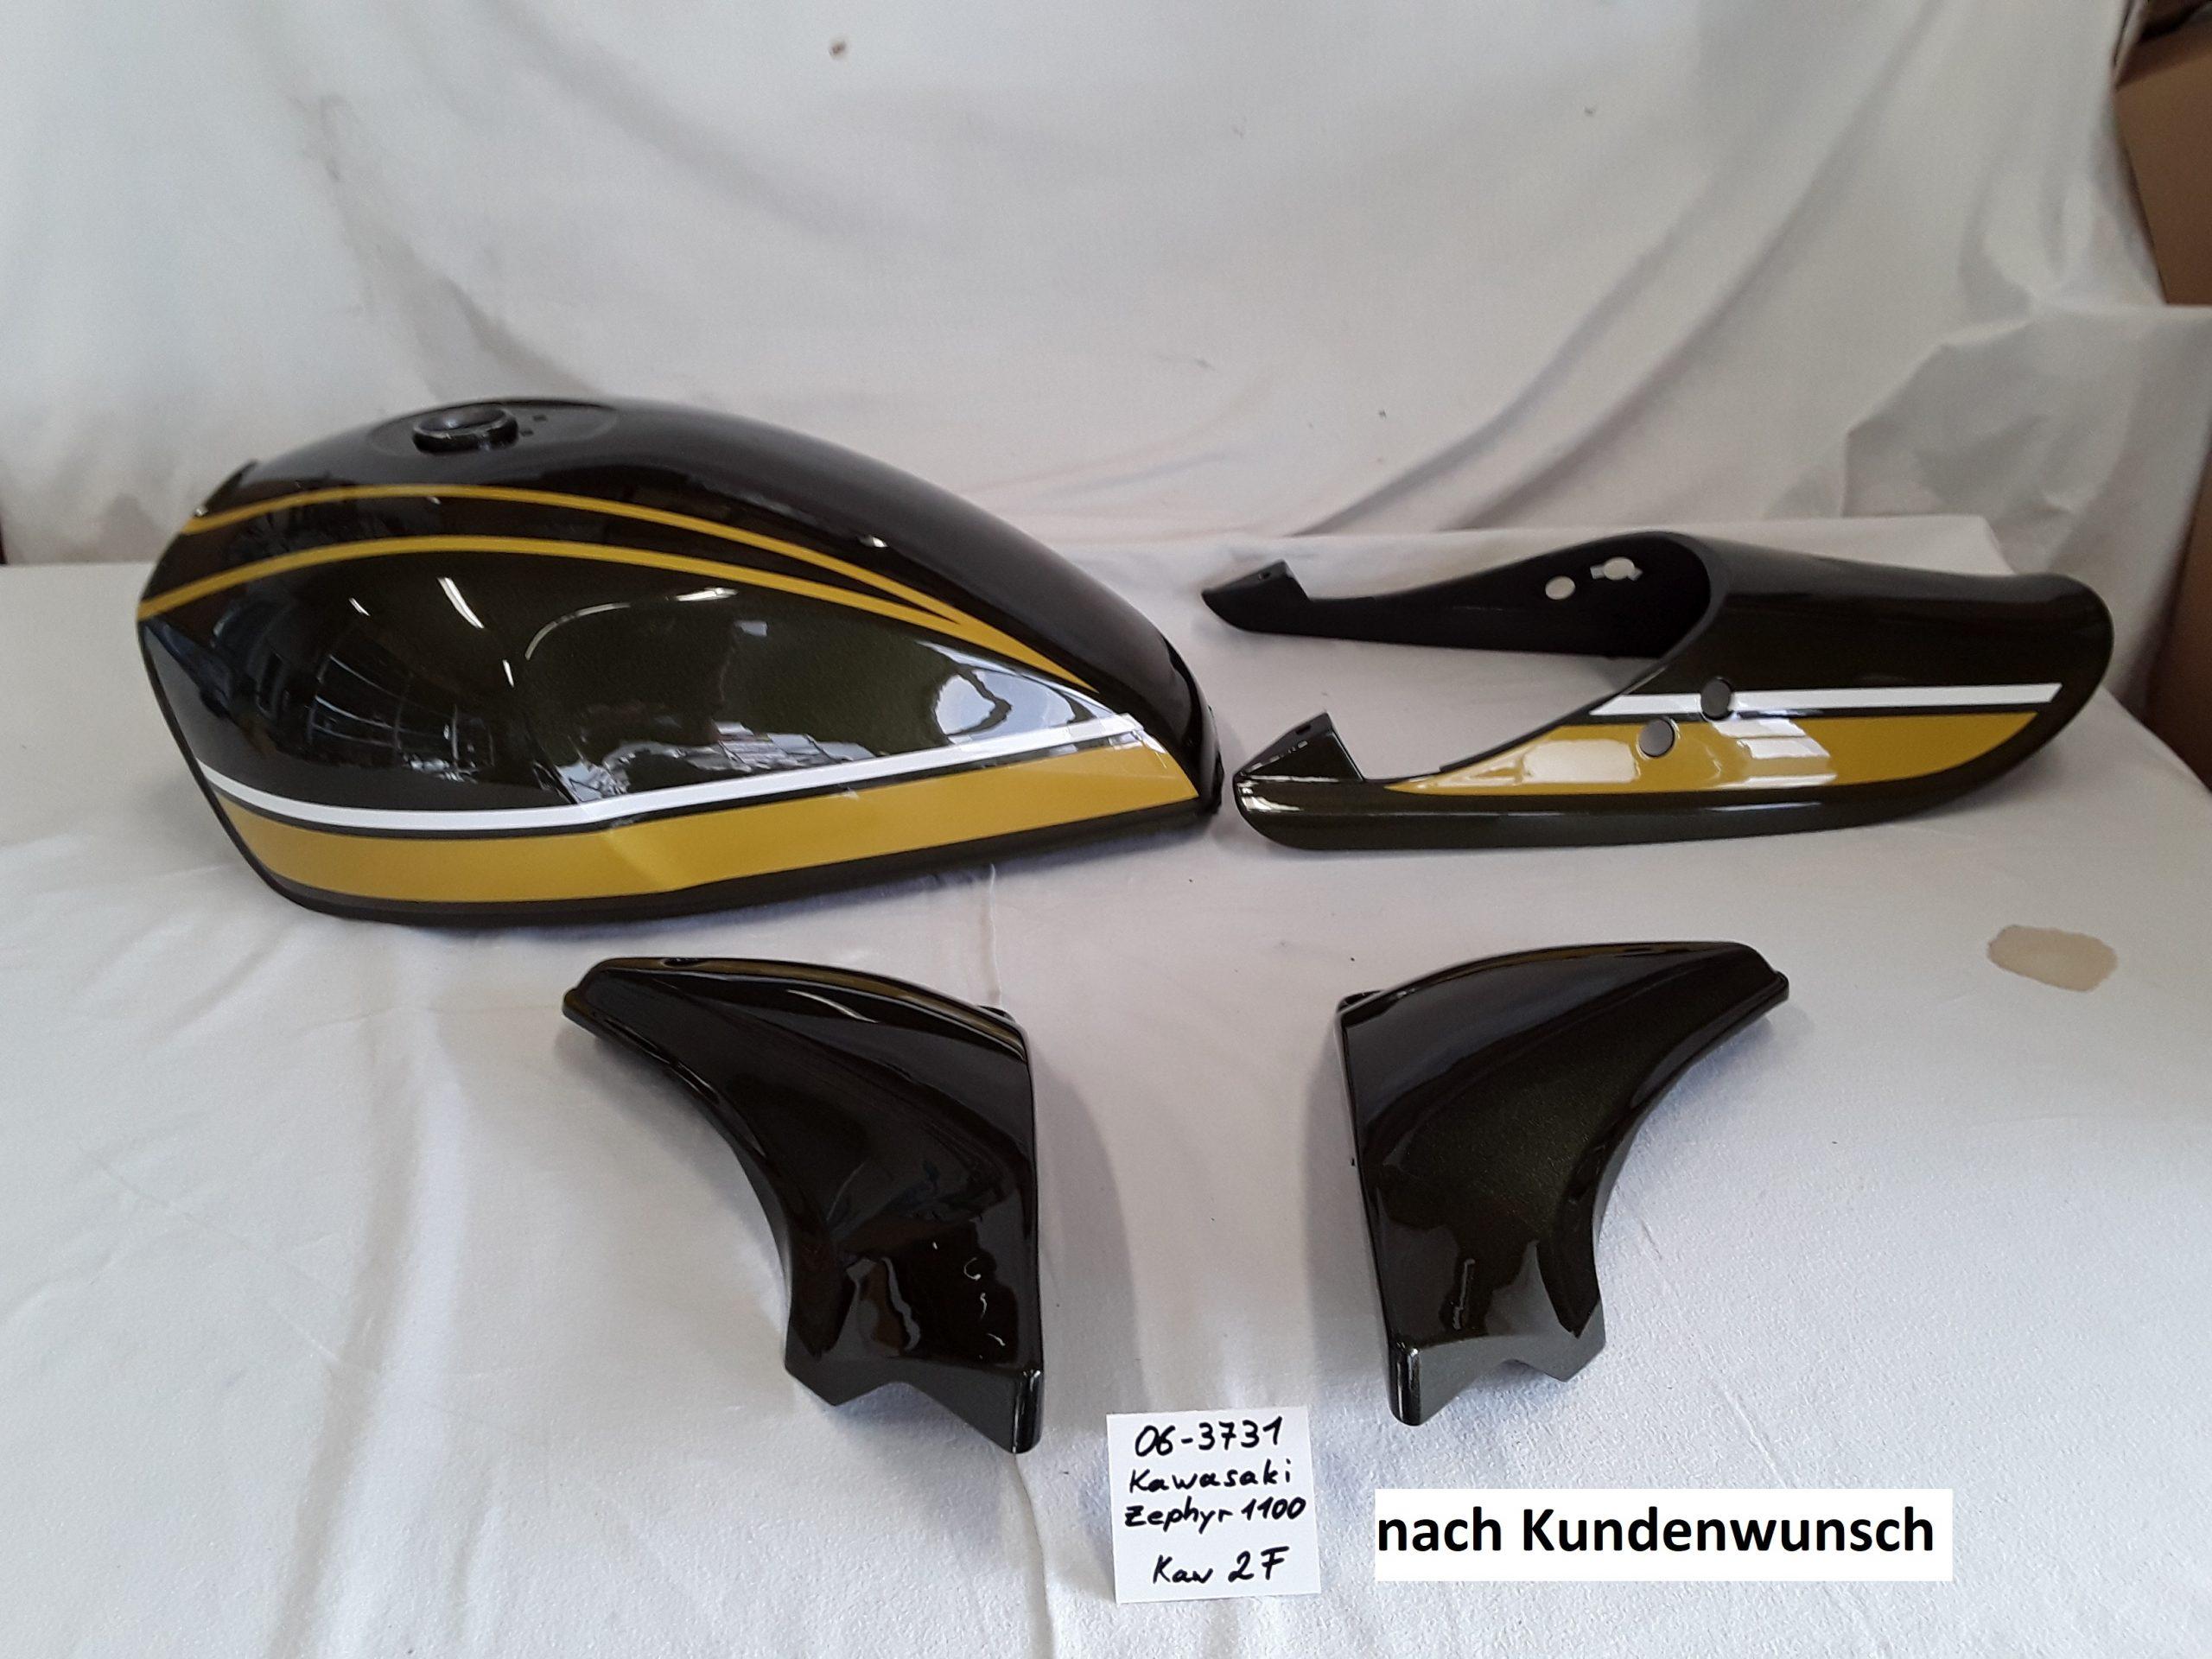 Kawasaki Zephyr1100 in 2F RH-Lacke Lackiererei Motorradlackierung 06-3731